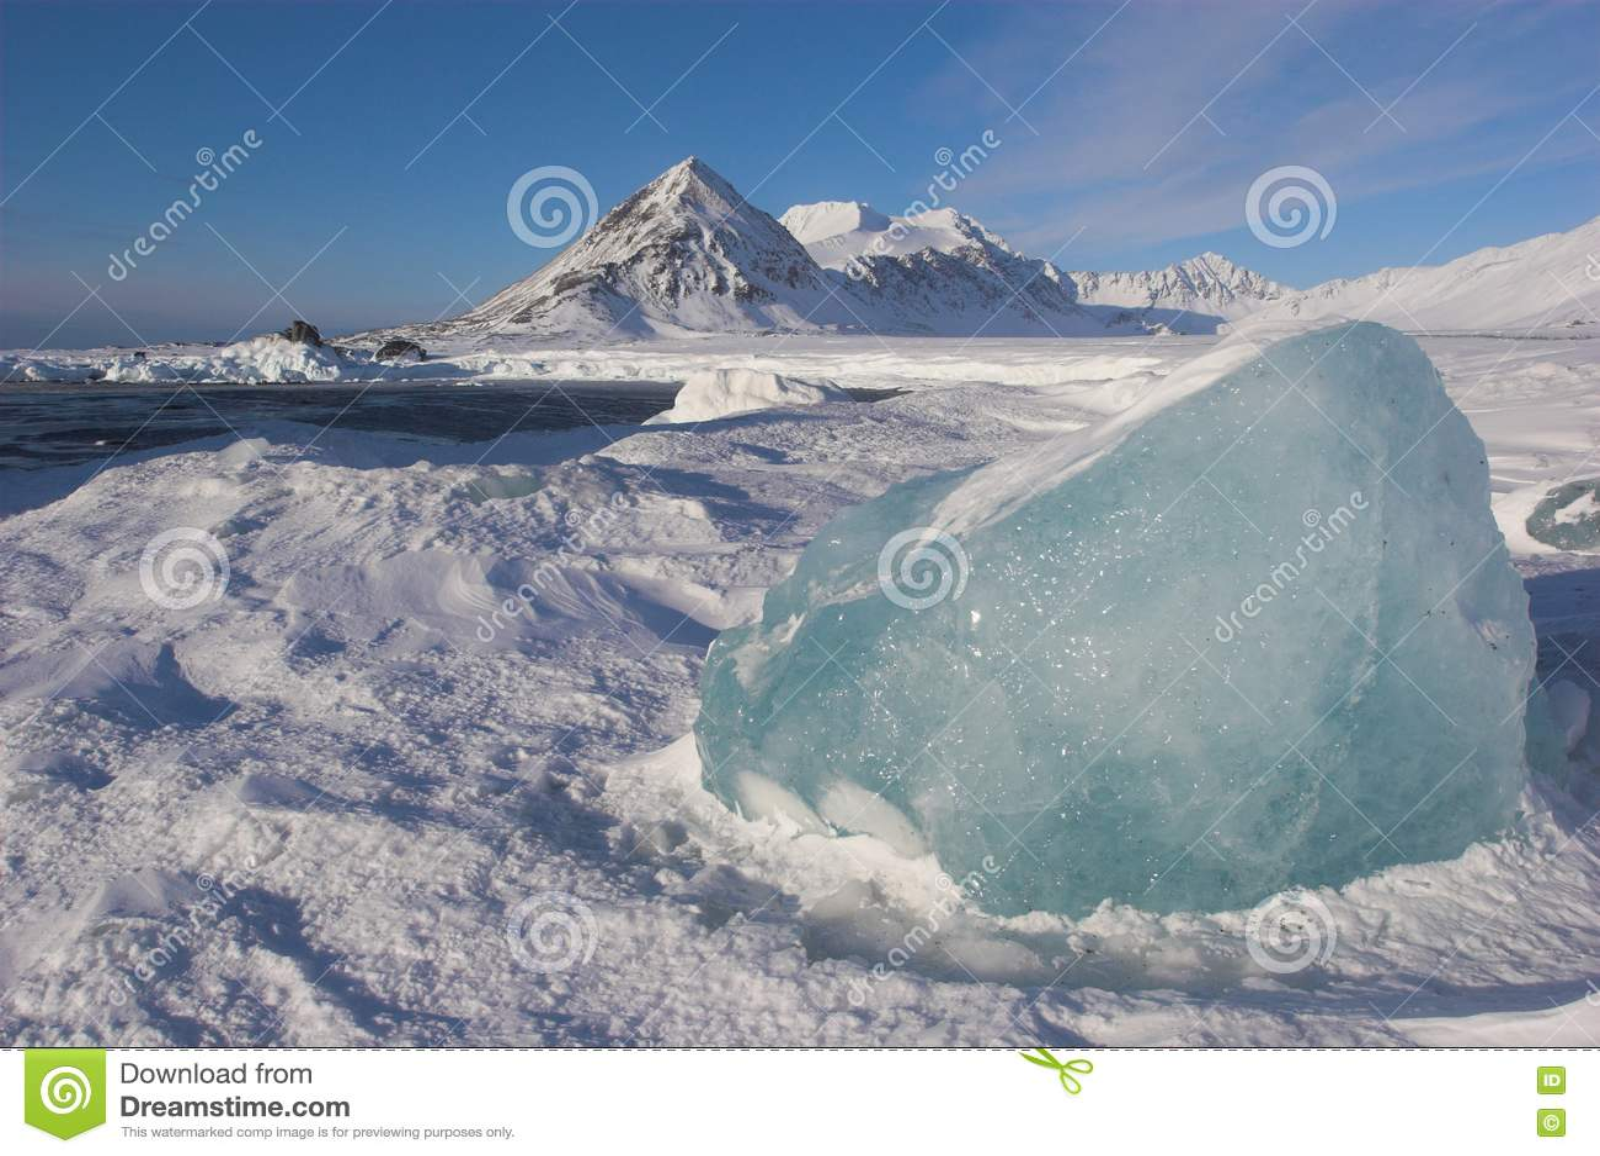 [Image: antarctic-winter-landscape-19515198.jpg]